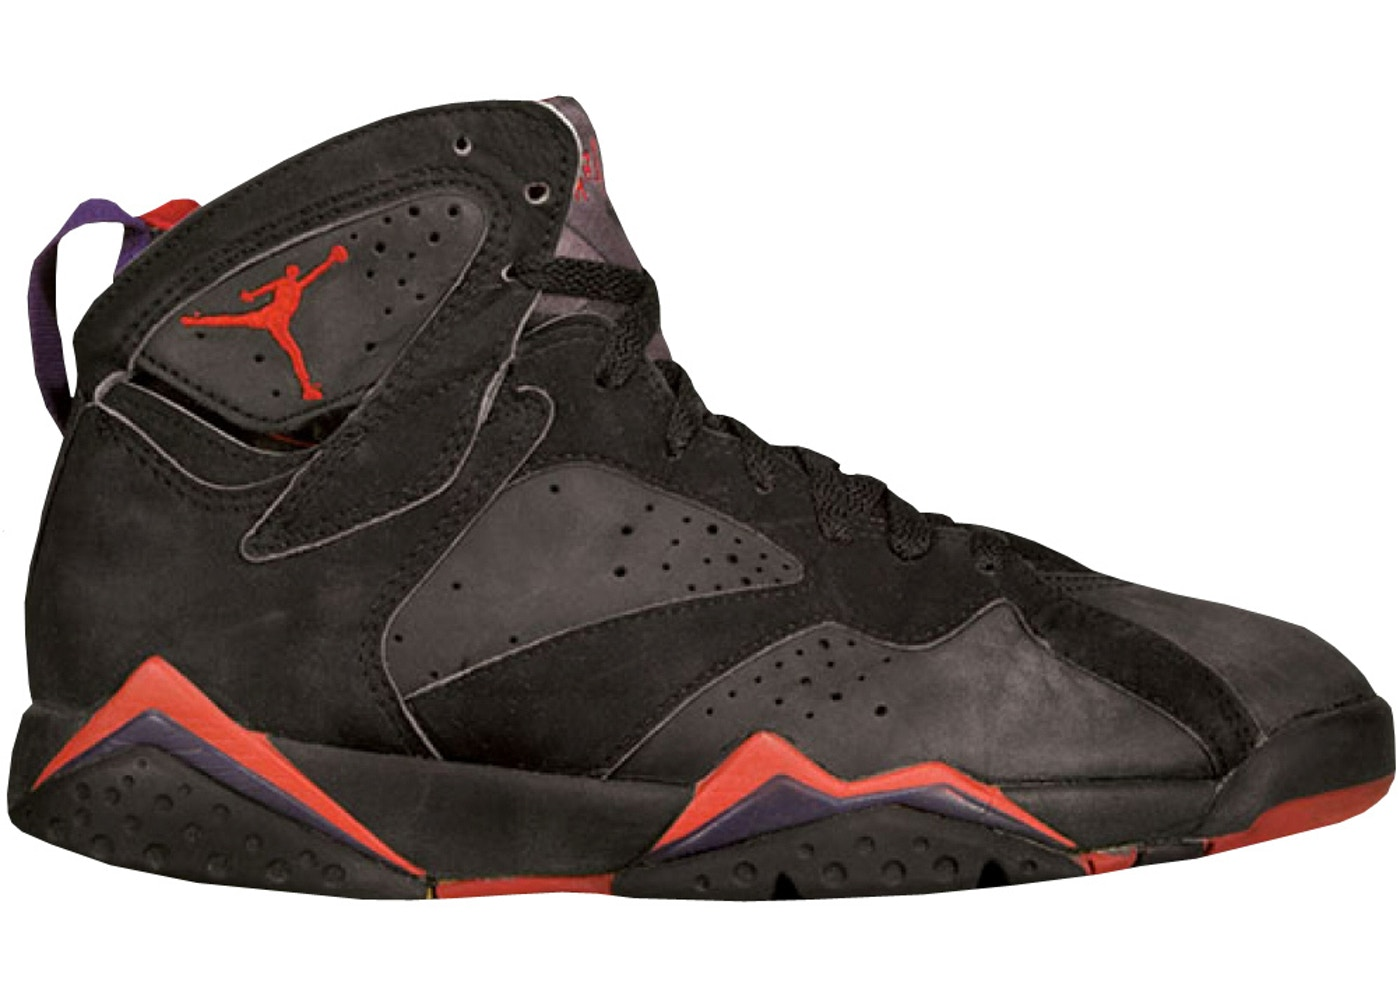 meet 37e26 846b0 Jordan 7 OG Raptors (1992) - 130014-060